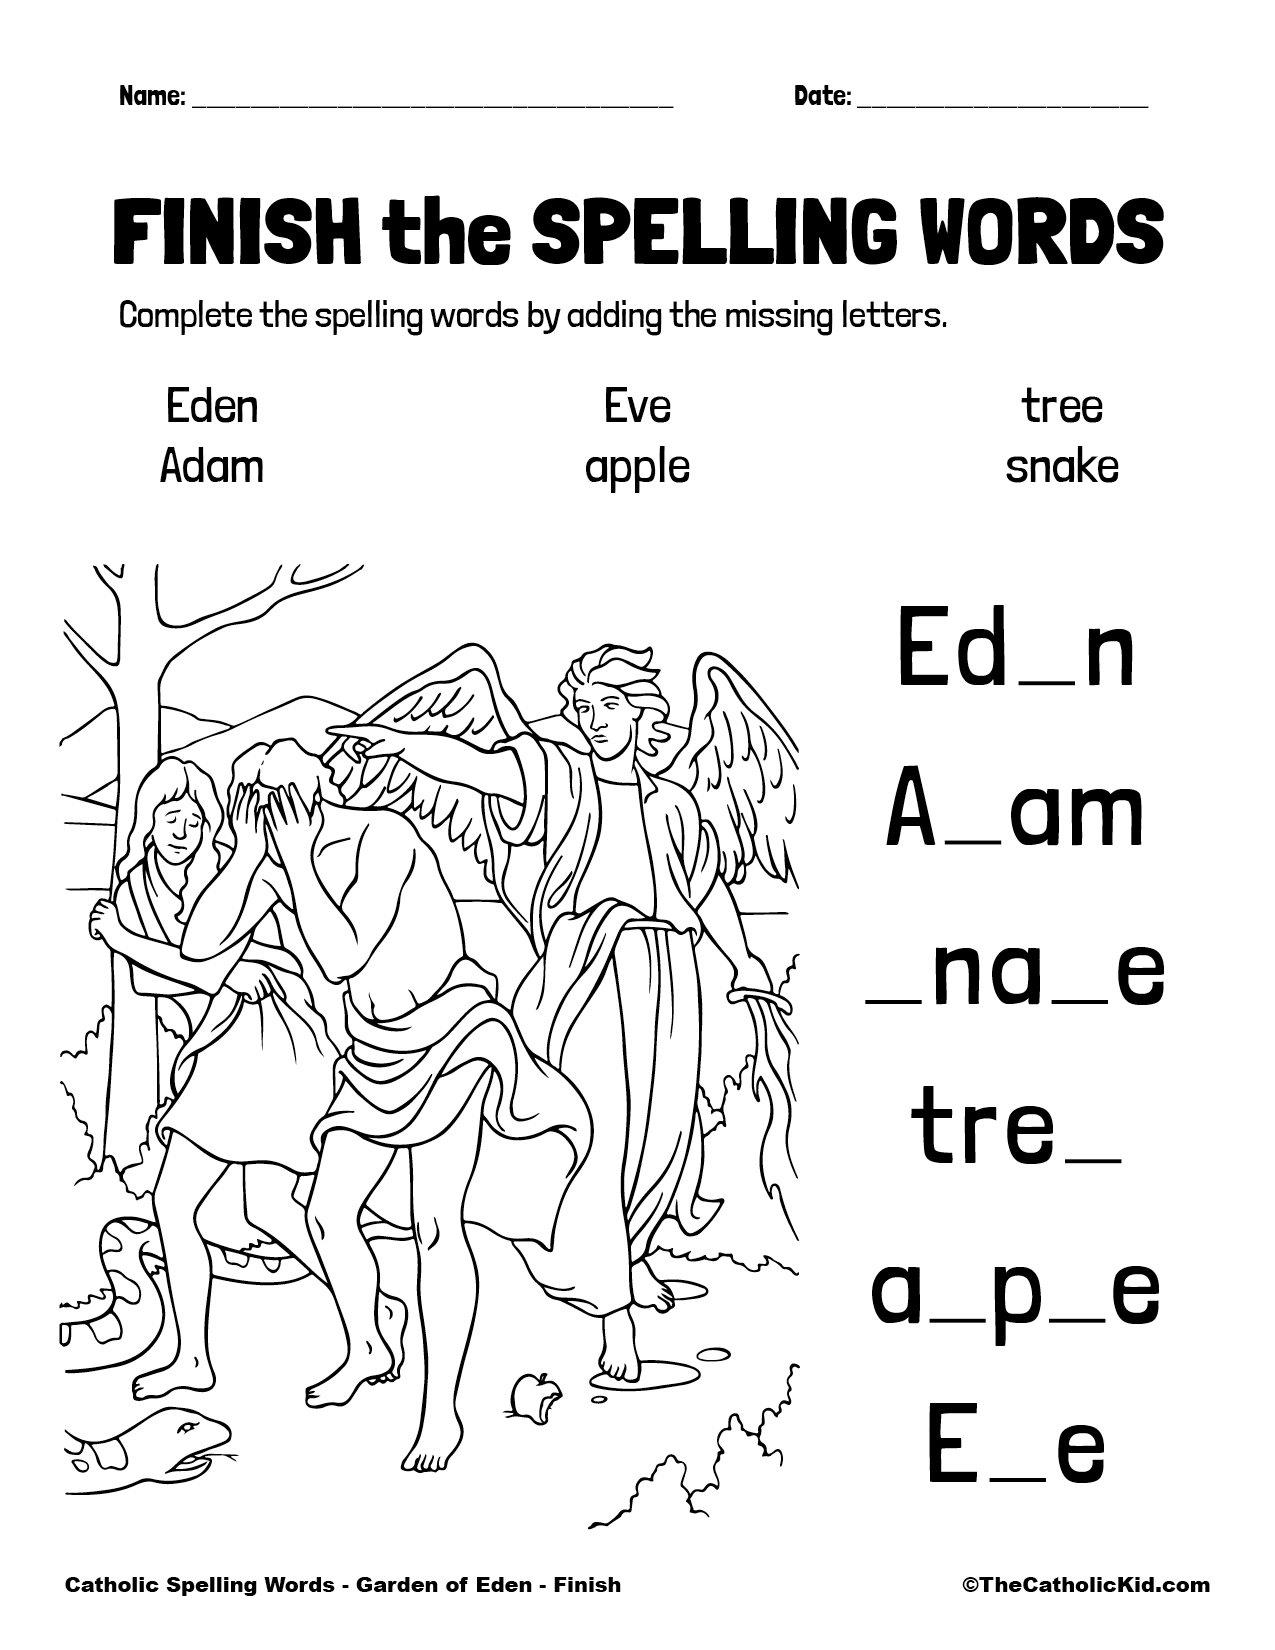 Catholic Spelling & Vocabulary Words Garden of Eden Worksheet 4 Finish